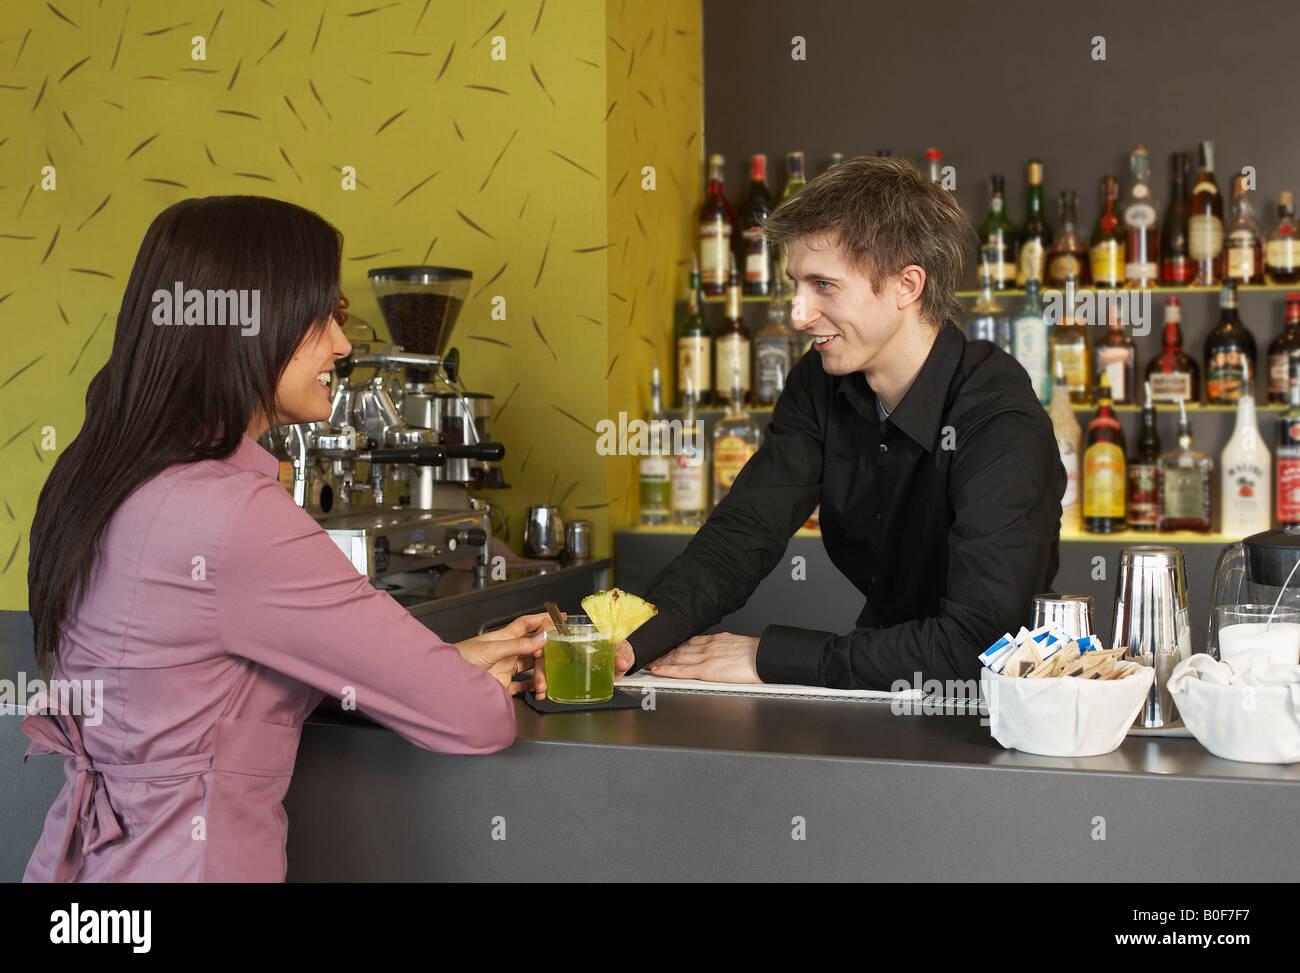 Young woman talking to barman - Stock Image